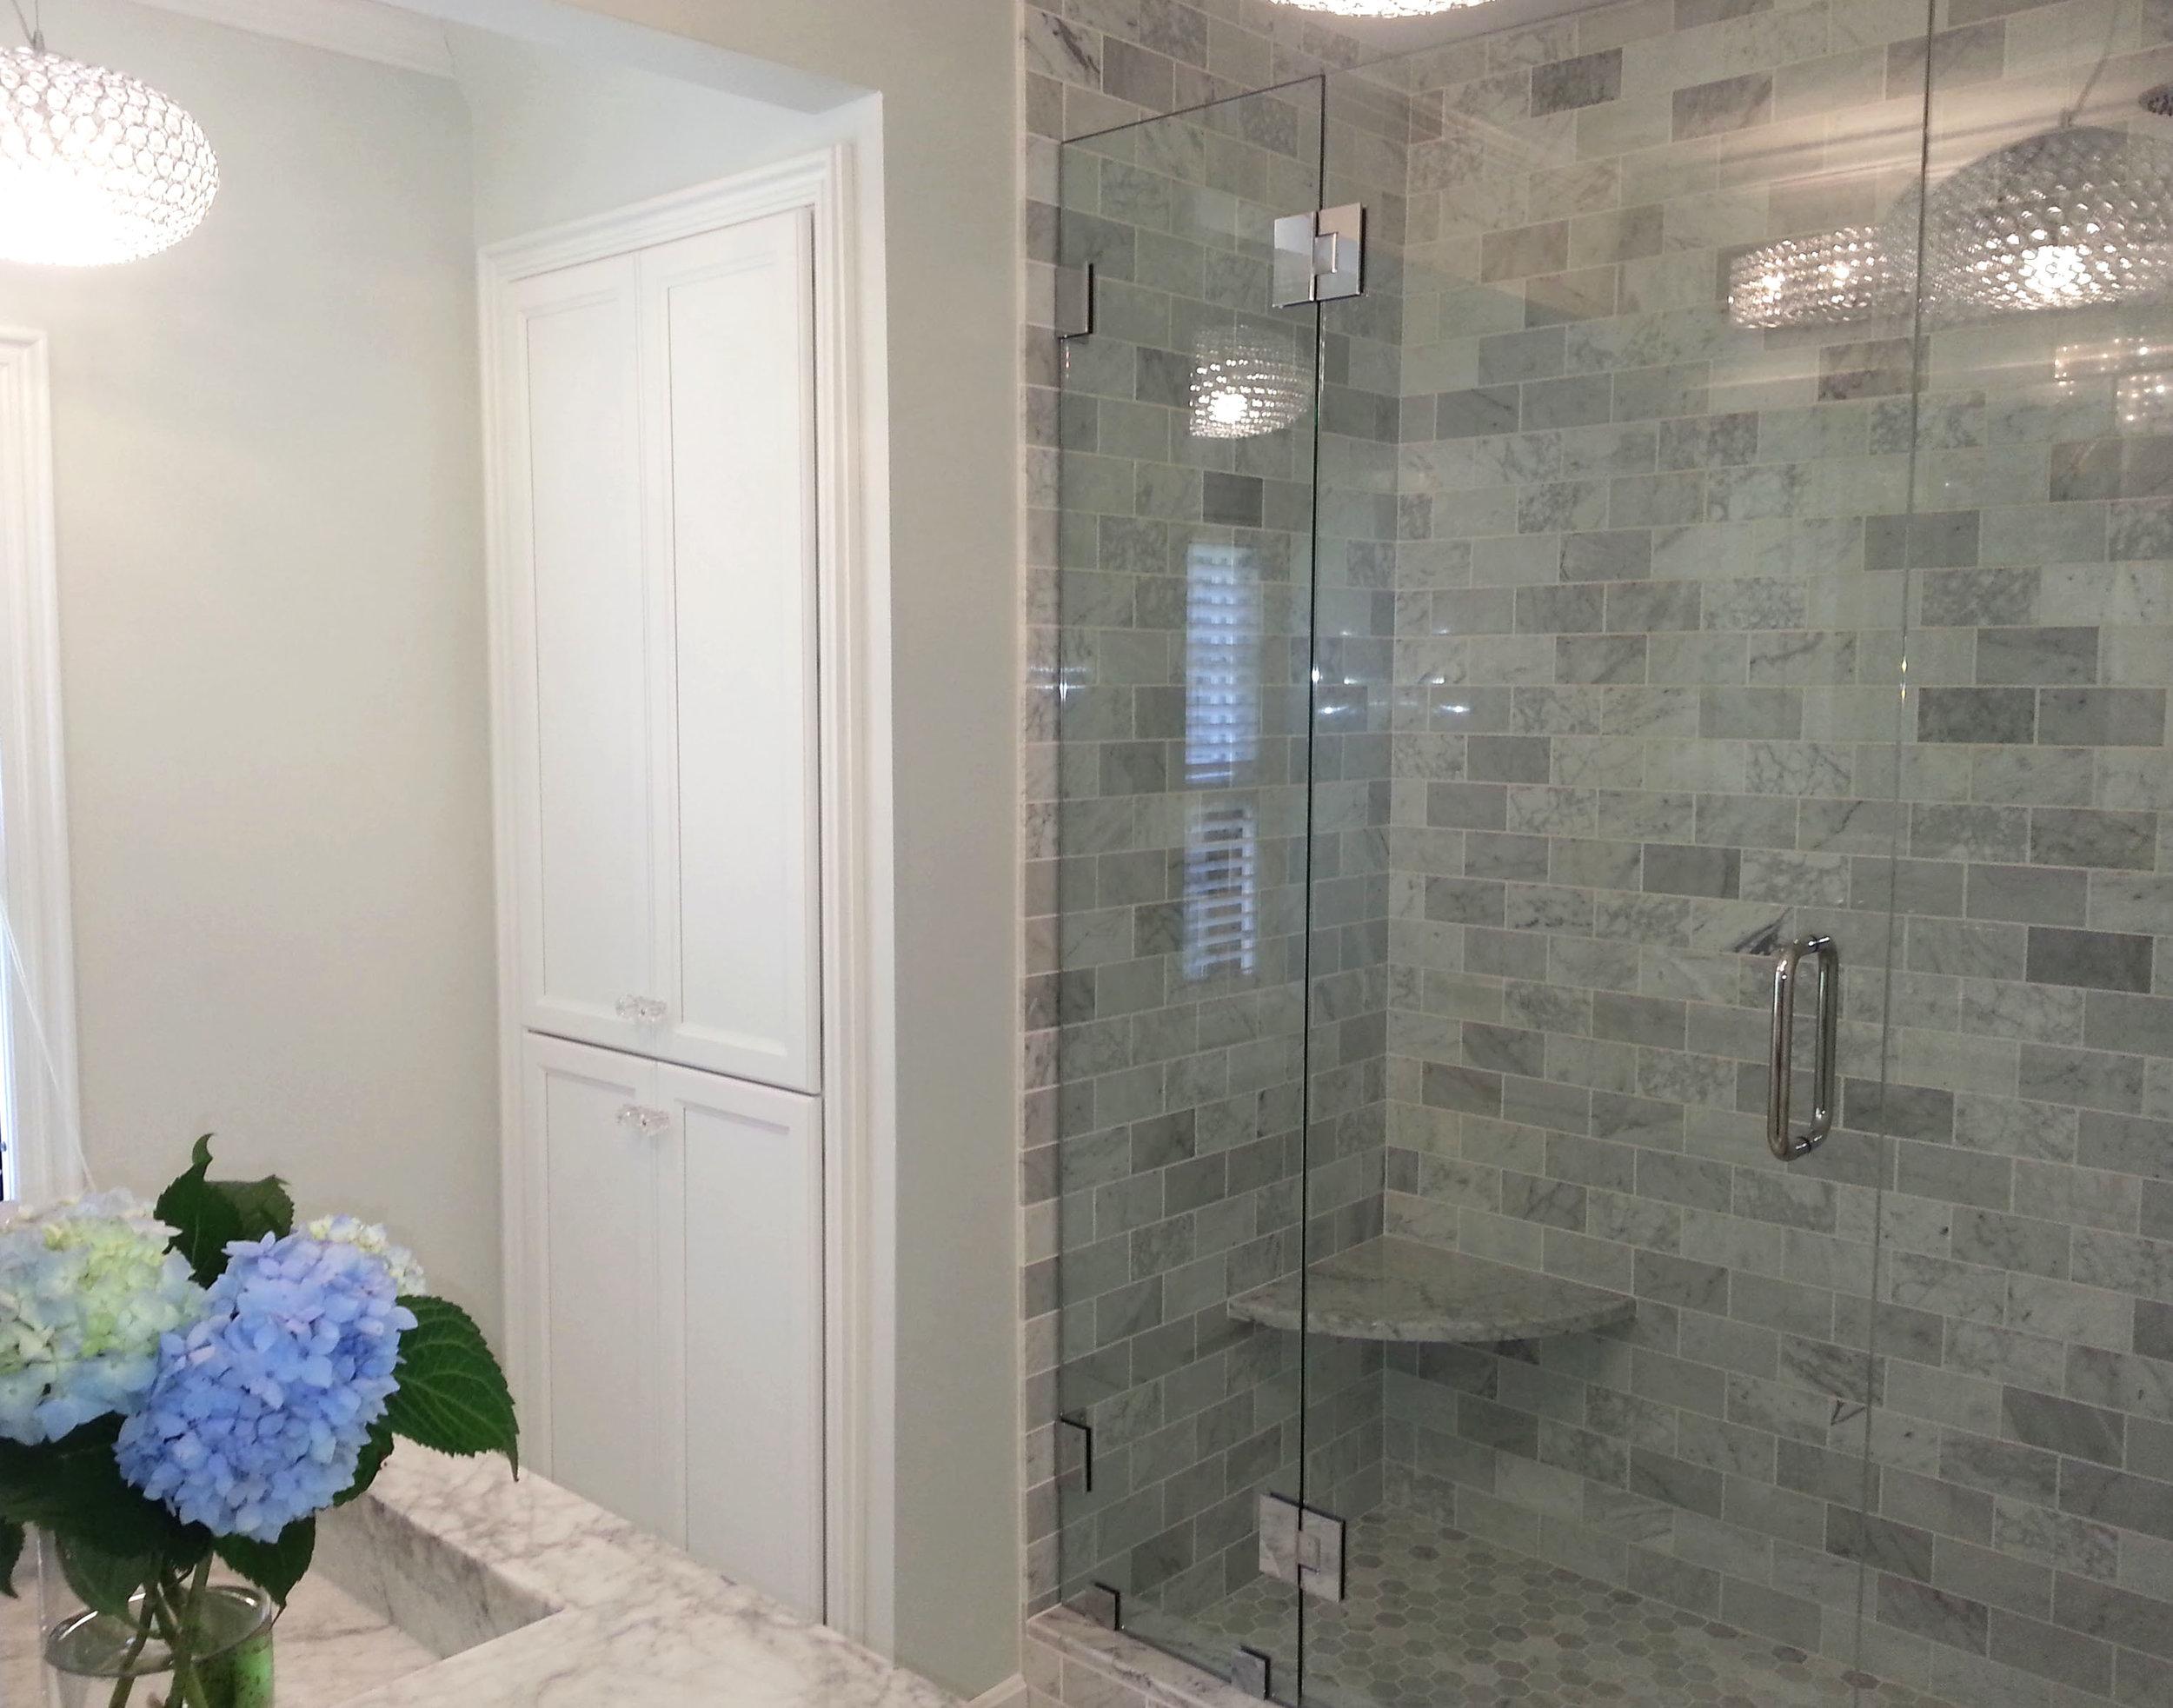 Hutch carrara bathroom 3.jpg